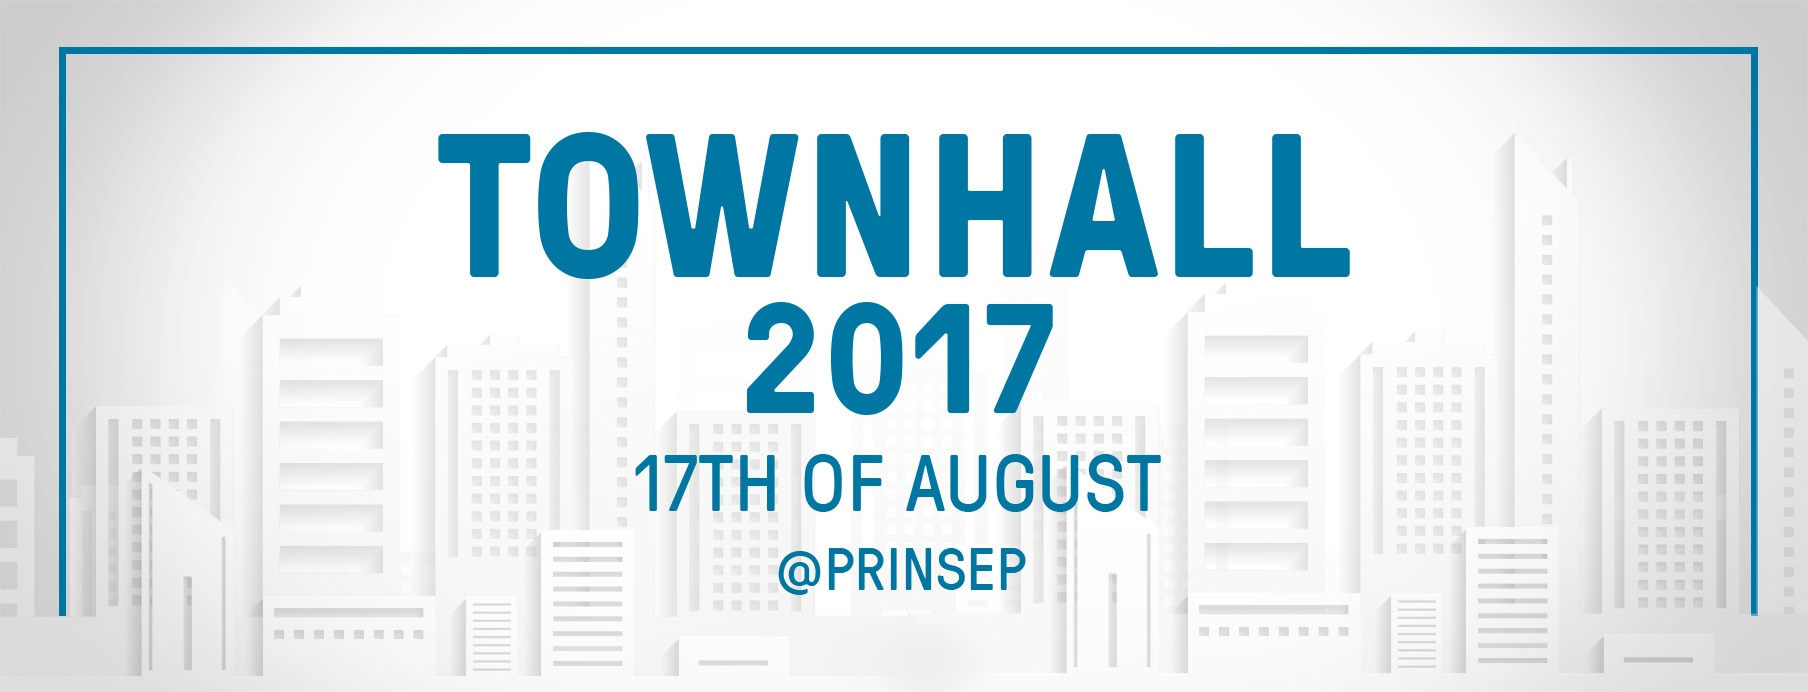 Townhall 2017.jpg